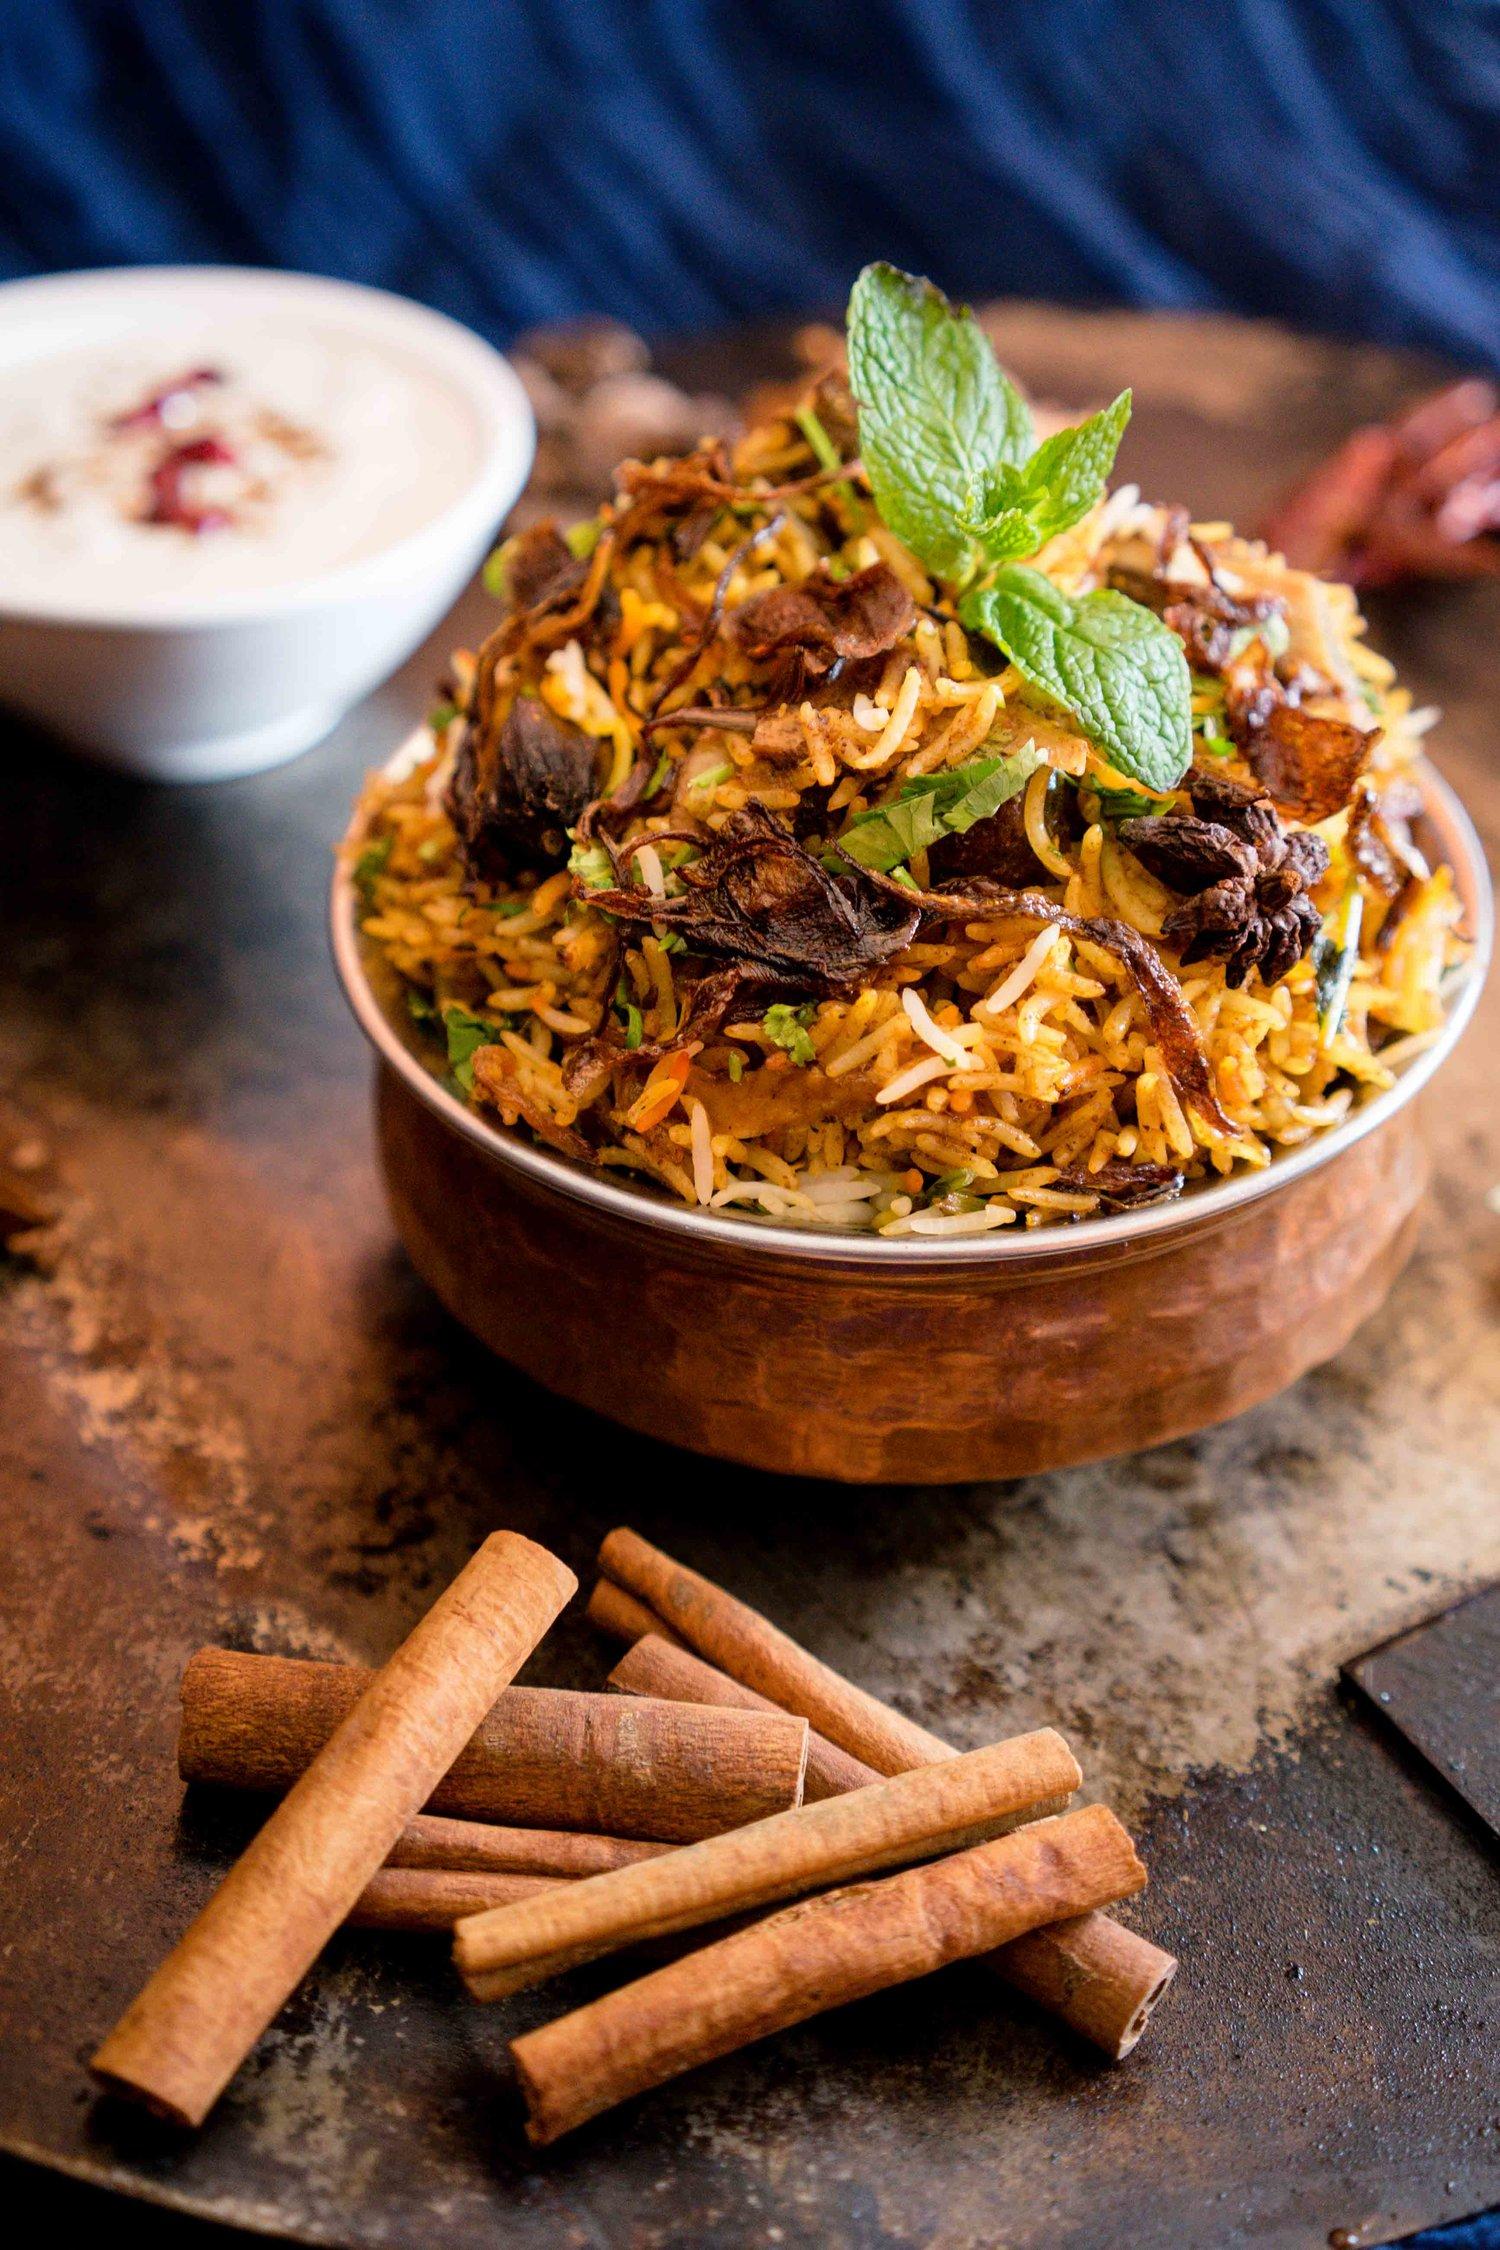 biryani-san-francisco-restaurant-food-photographer-a-few-good-clicks-net